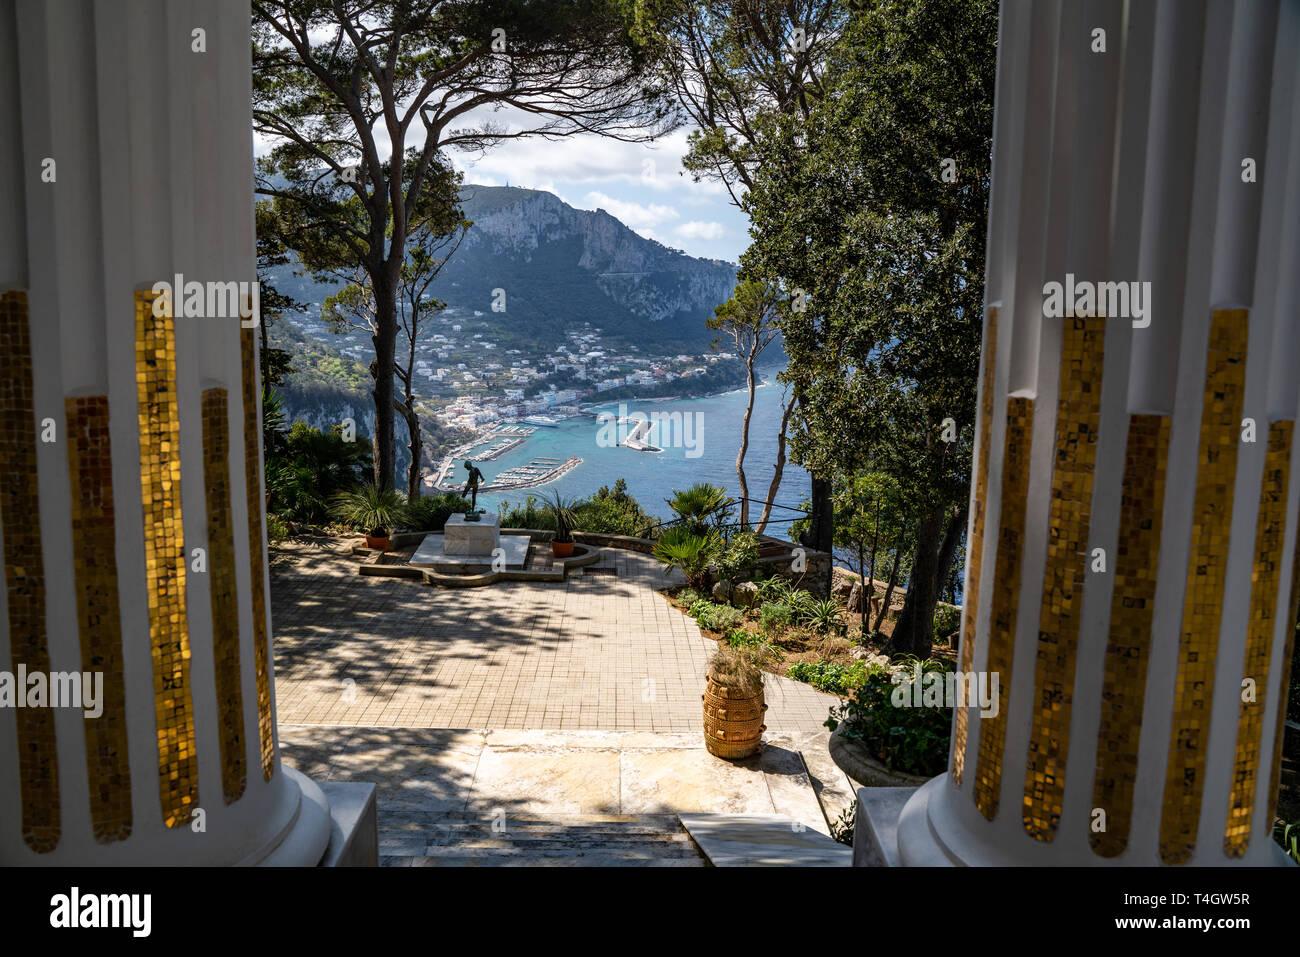 Villa Lysis, Fersen, Capri Foto stock - Alamy